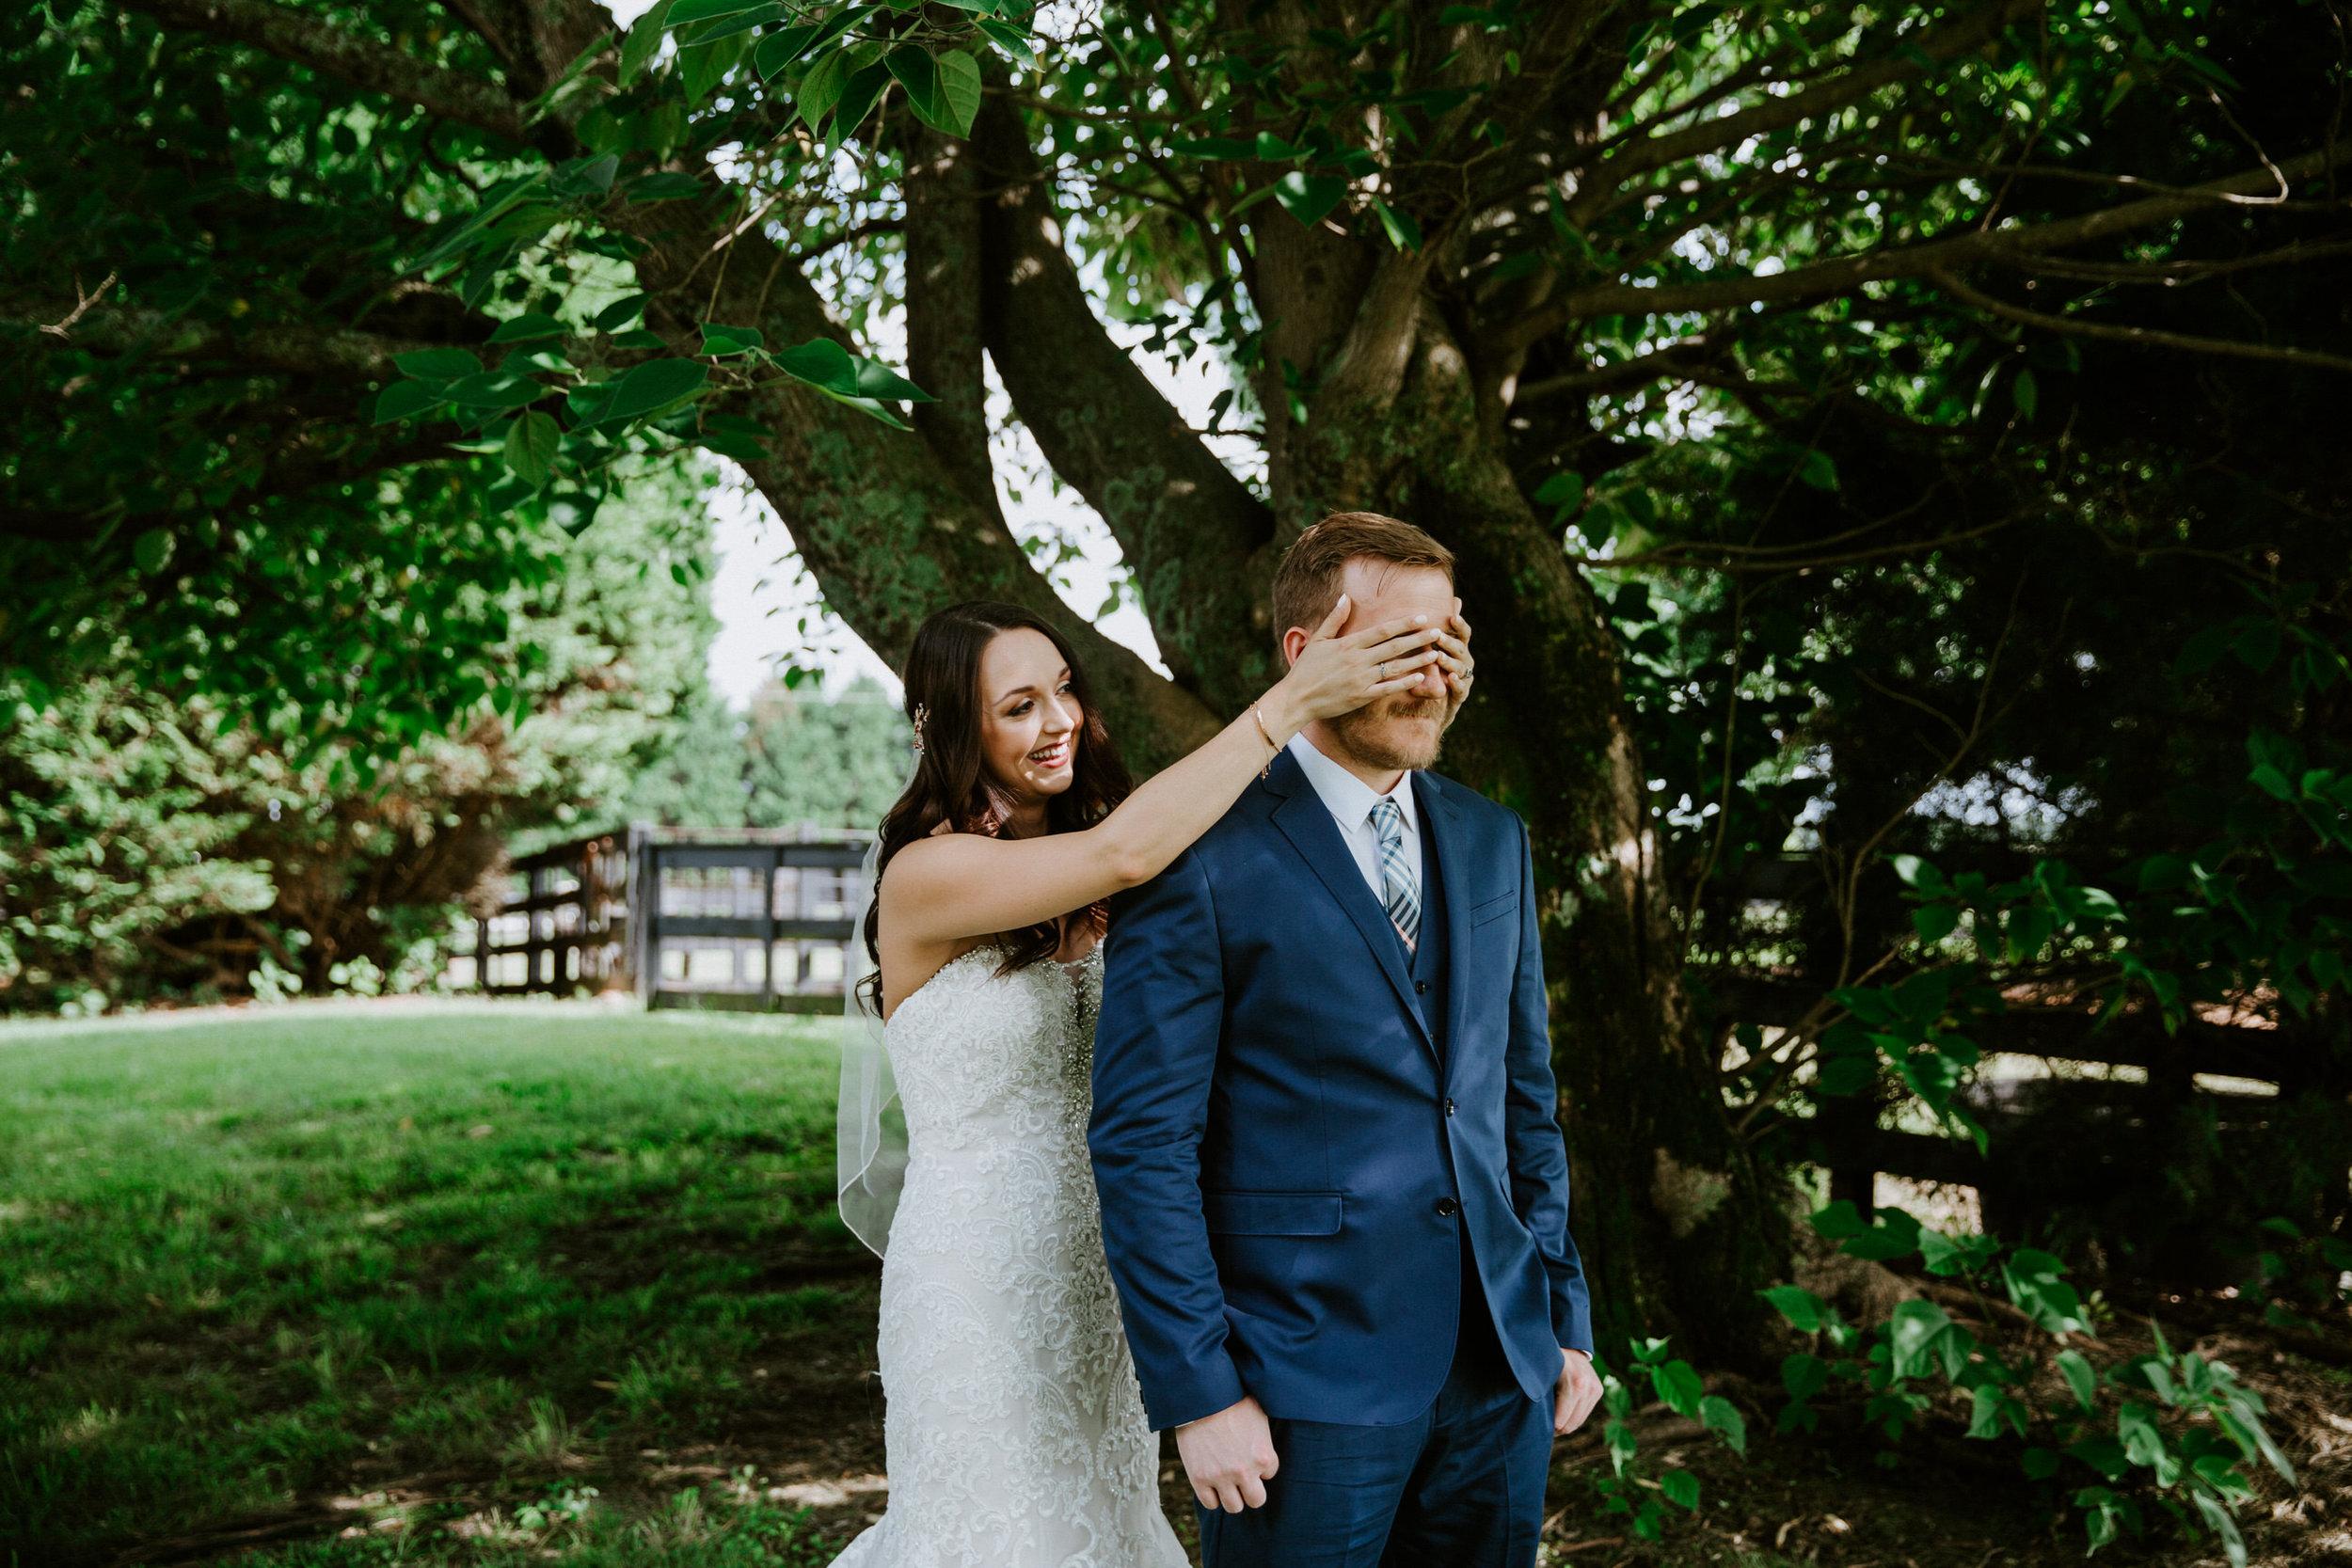 First Look Wedding Photos Taylor Heery Photography